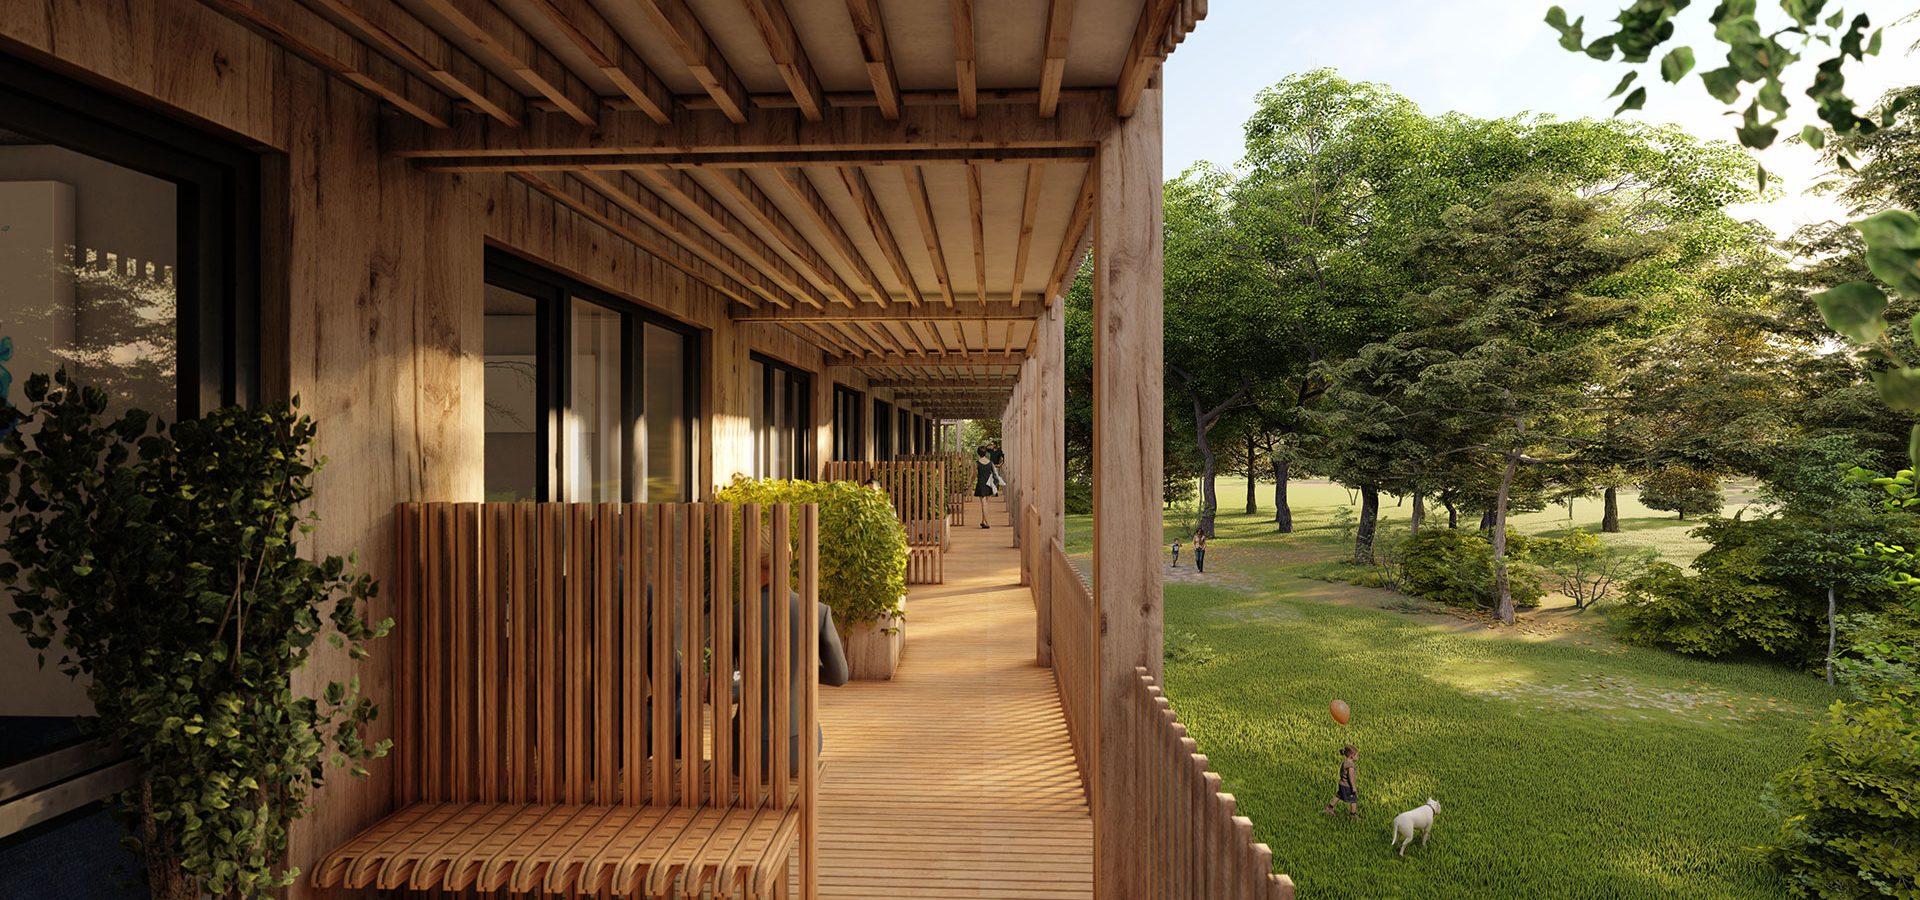 FARO architecten Heilige huisjes 07